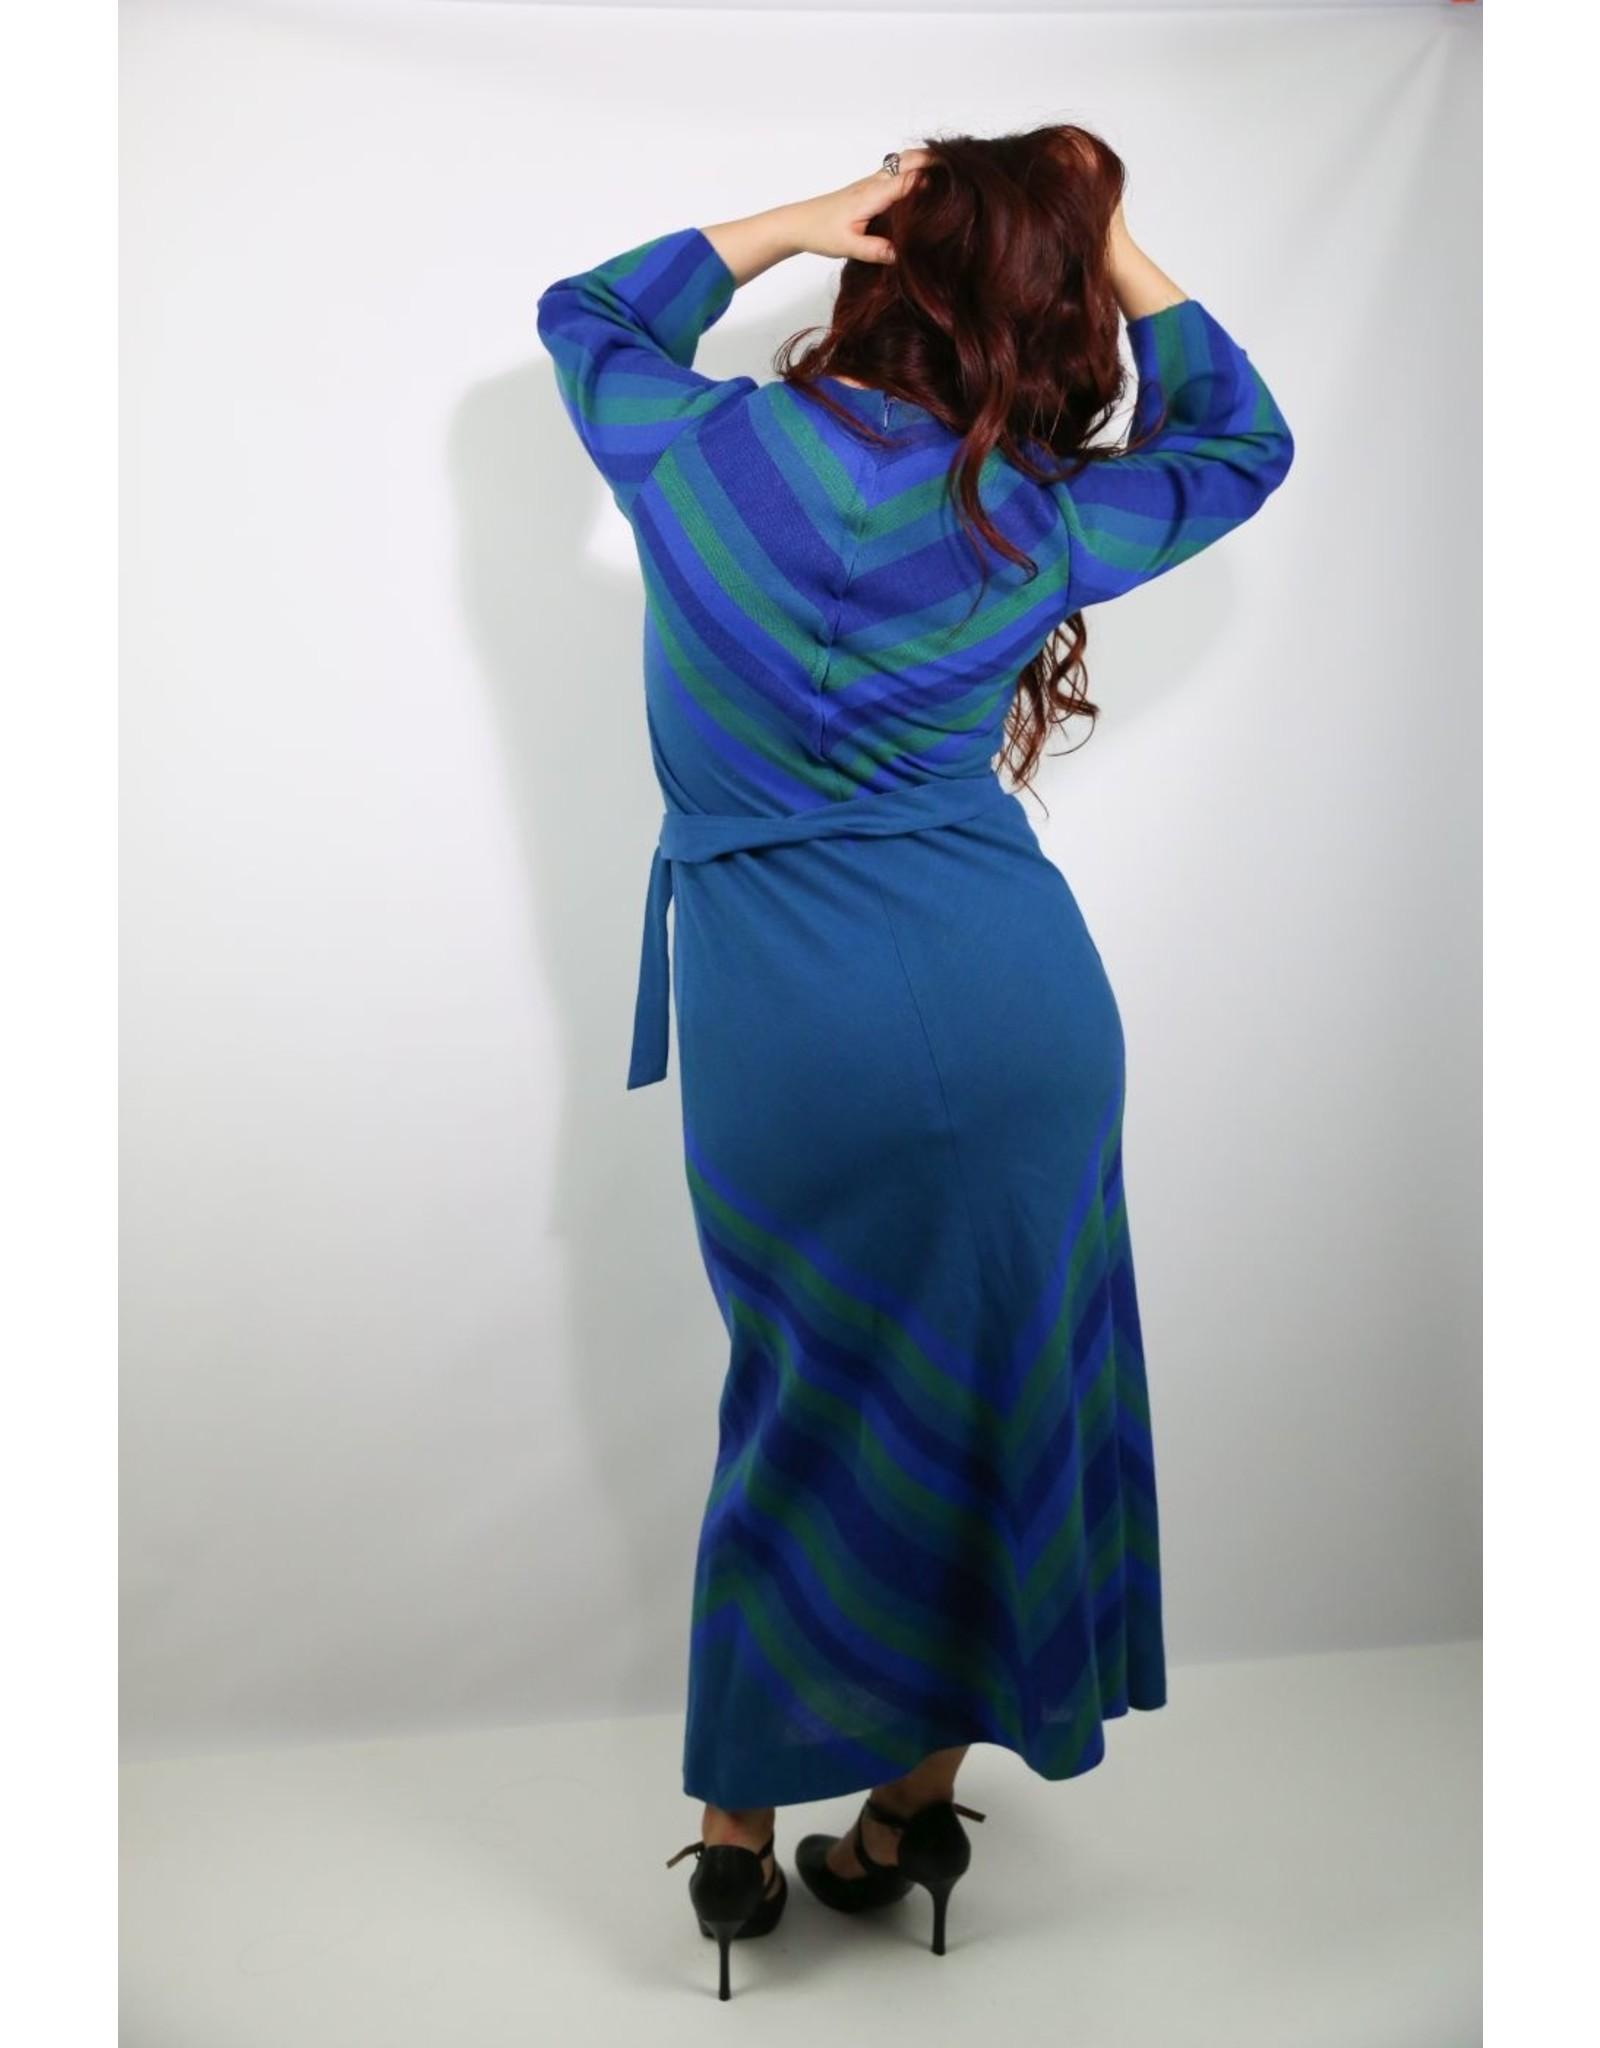 1970's Plus Size Blue & Green Knit Maxi Dress